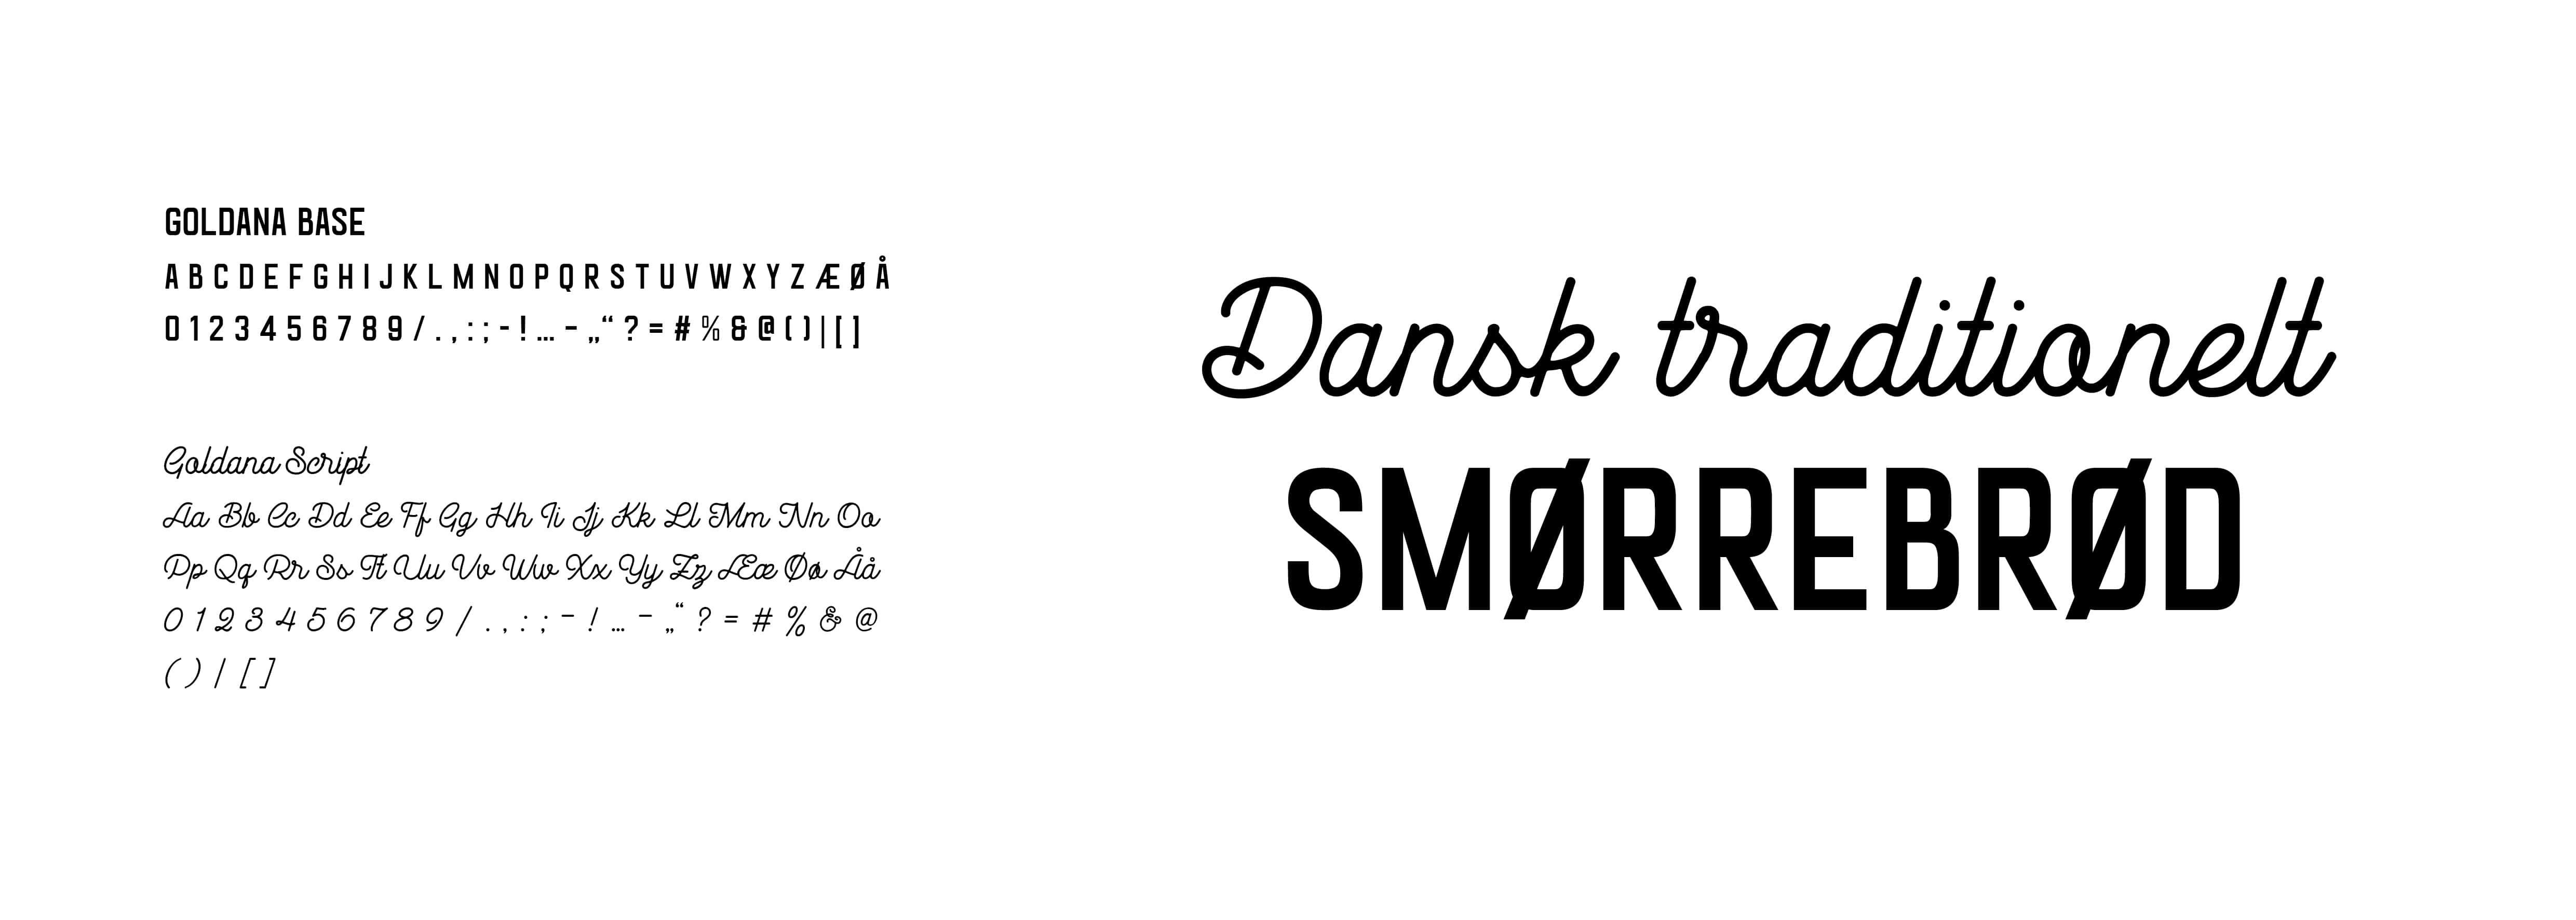 typography_philipjohansen_idadavidsen